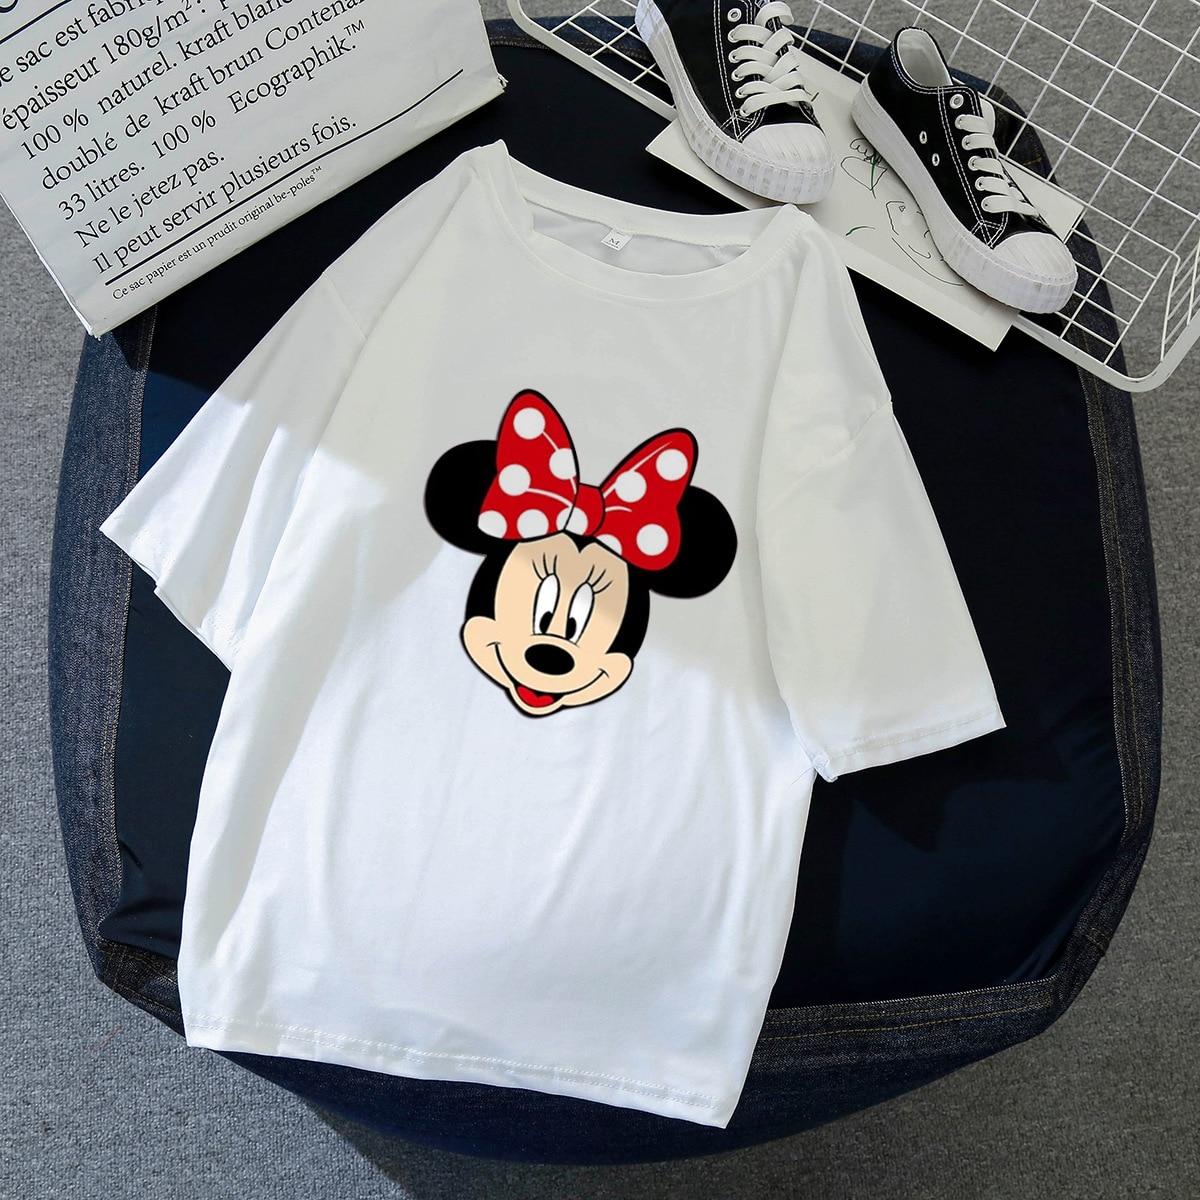 2020 Women's T-shirt Cartoon Animal Mouse Short Sleeve Summer Shirt Minnie Shirts Couple Shirt T Shirt Women Clothing